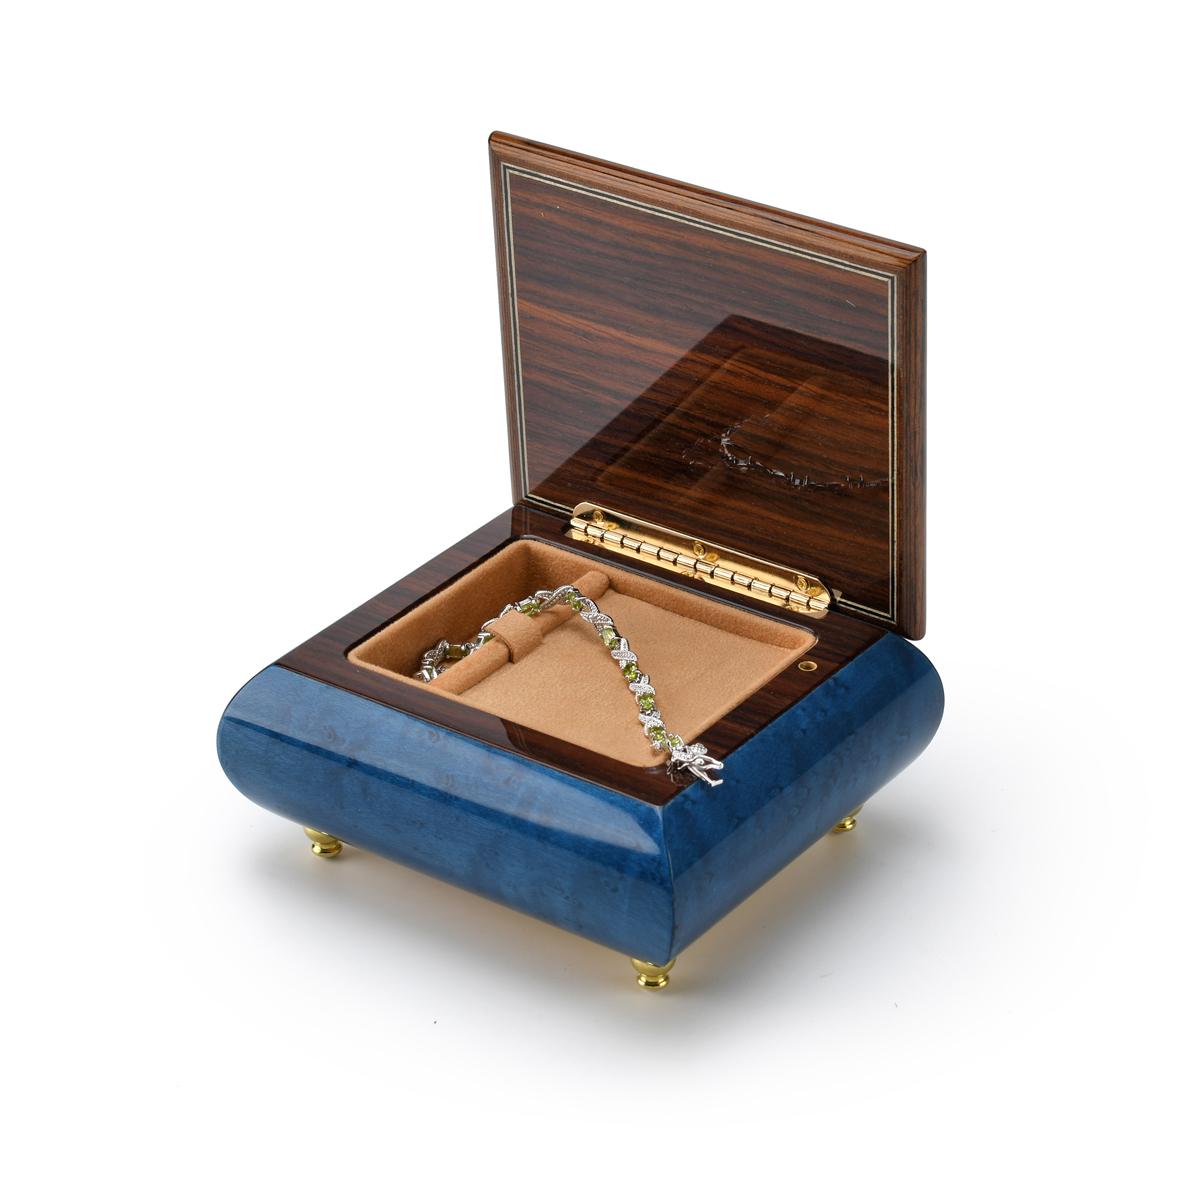 Vibrant Blue Nautical Theme Inlay of Anchor Music Box